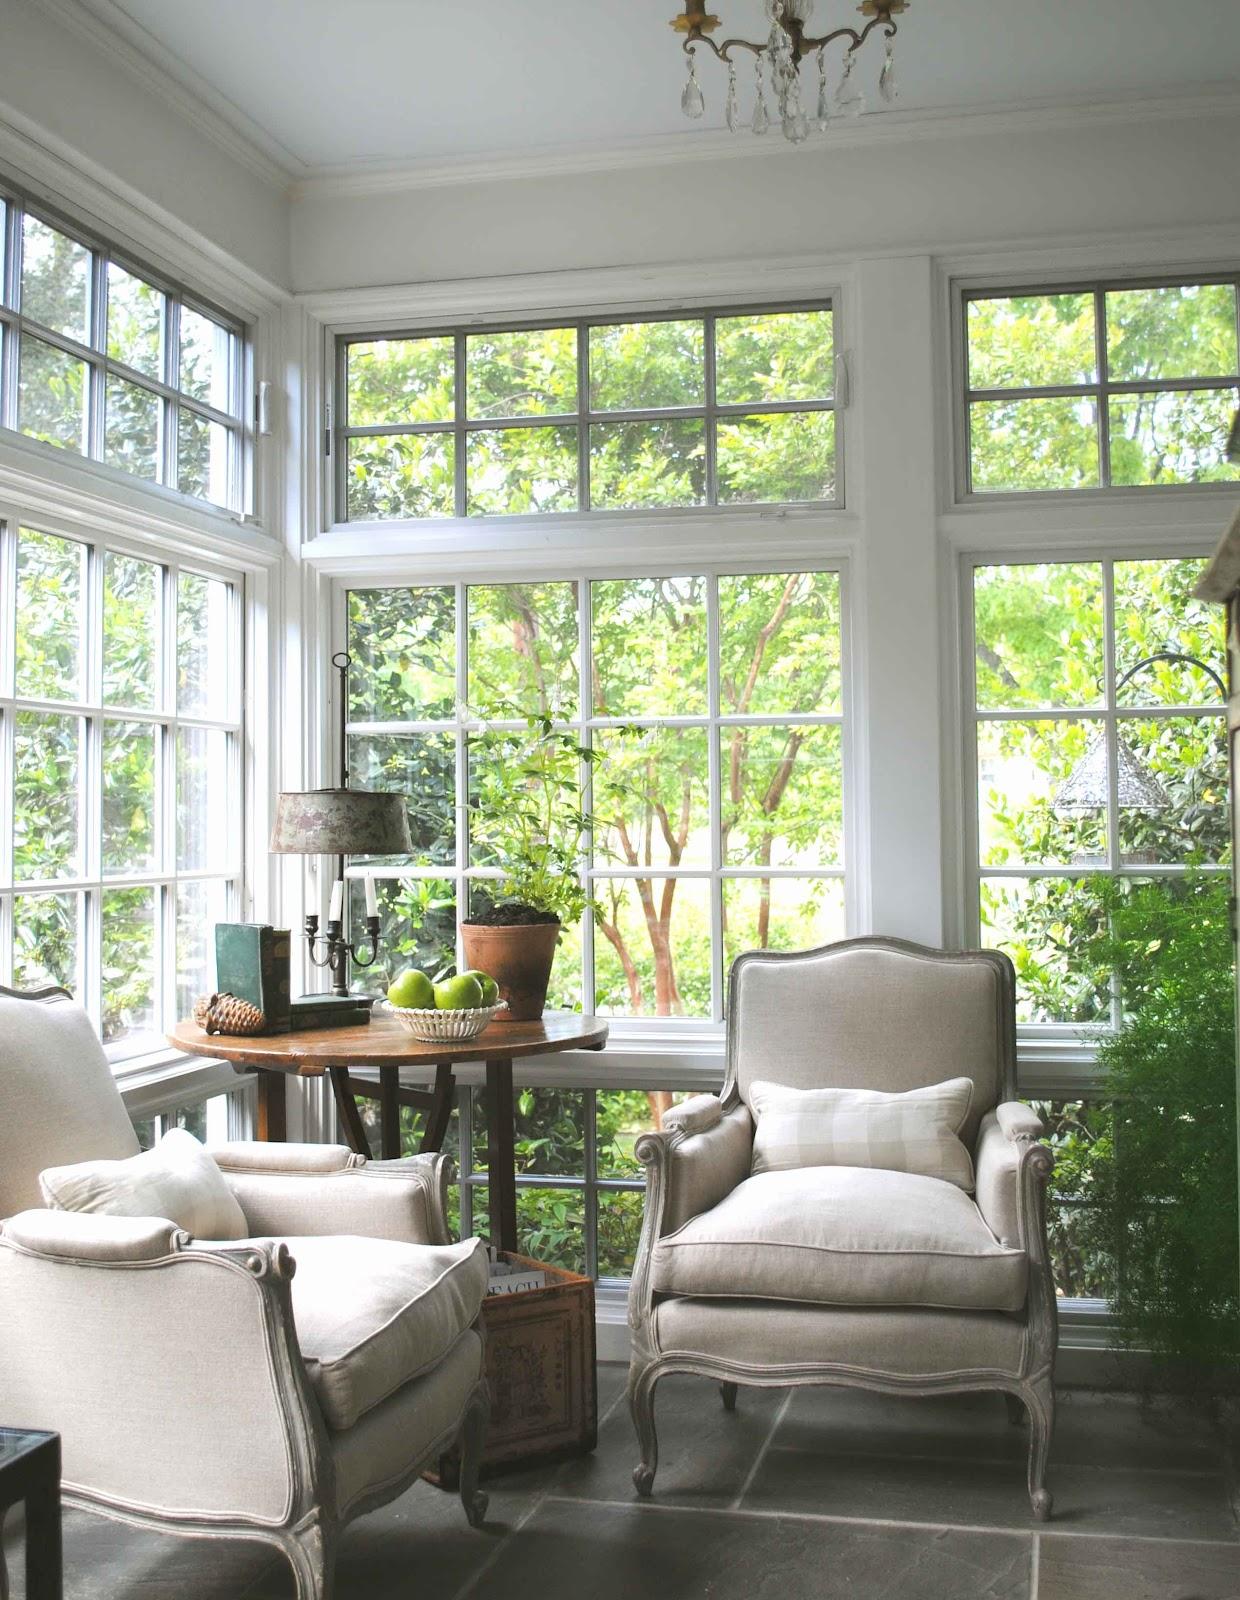 French Interior Design: Interior & Garden Design: A Swedish Style